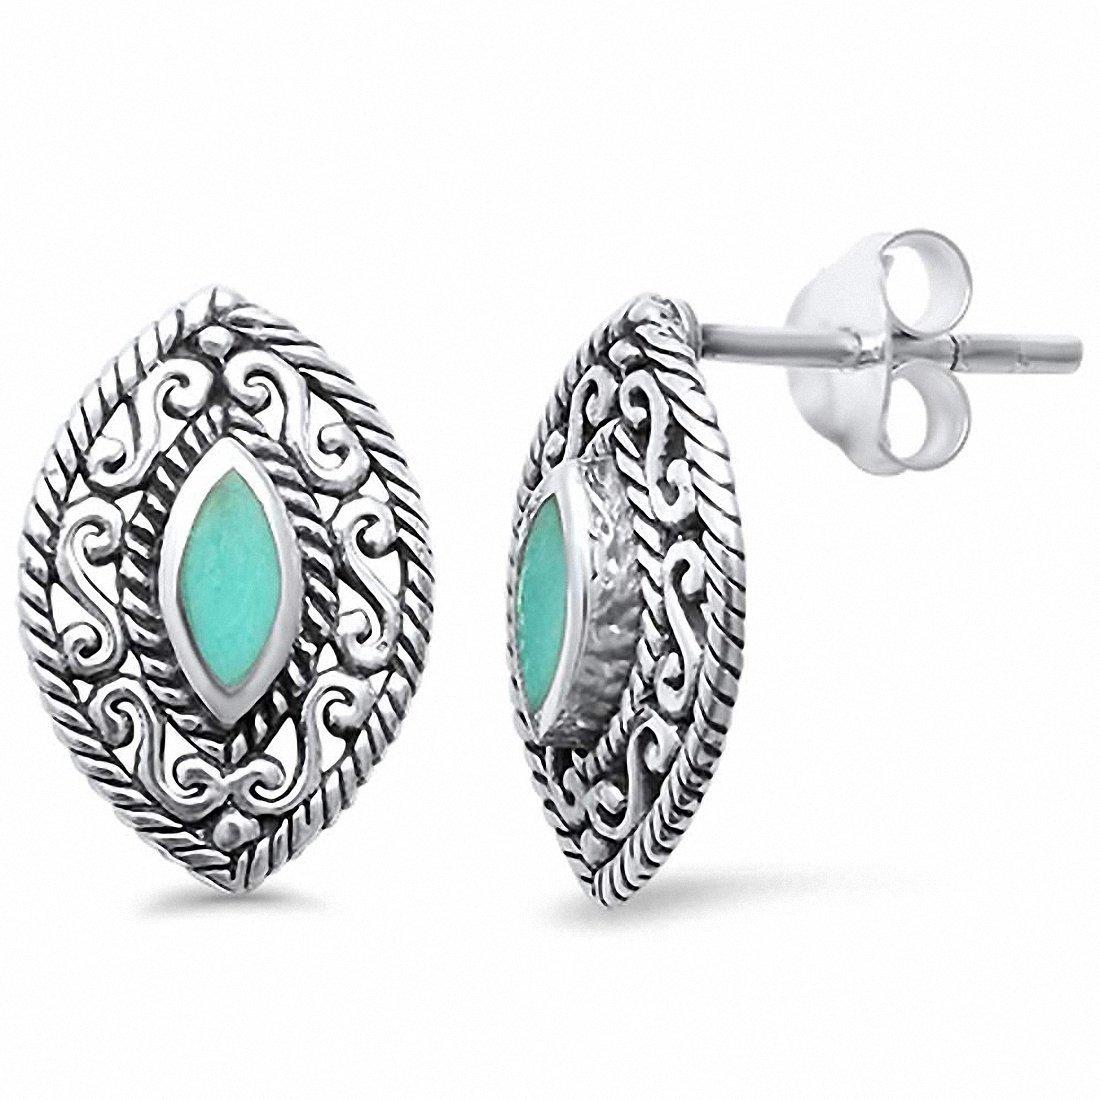 Filigree Marquise Stud Earrings 925 Sterling Silver Choose Color